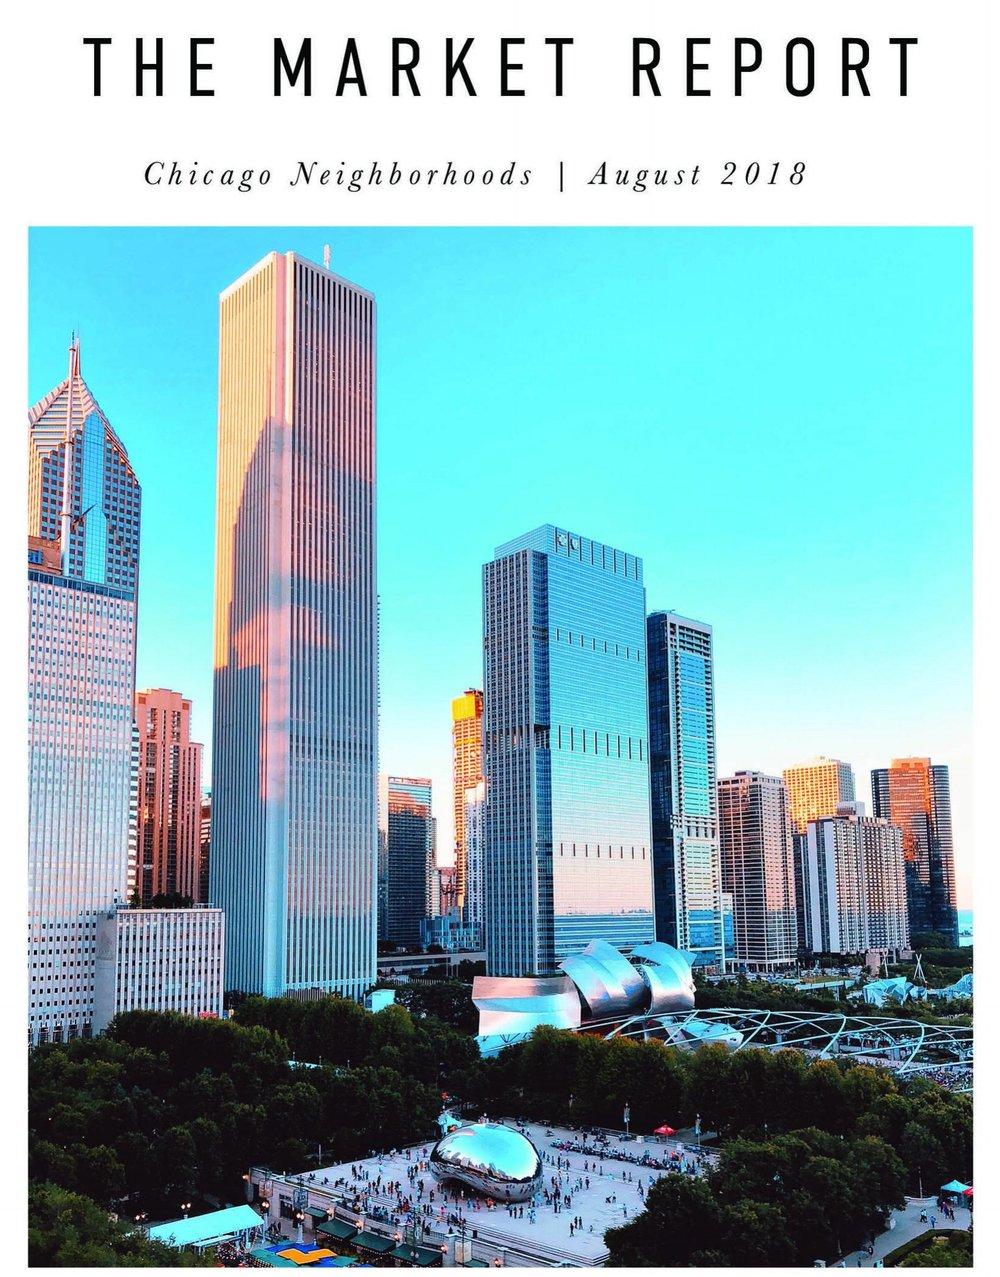 Market Report Cover August 2018.jpg